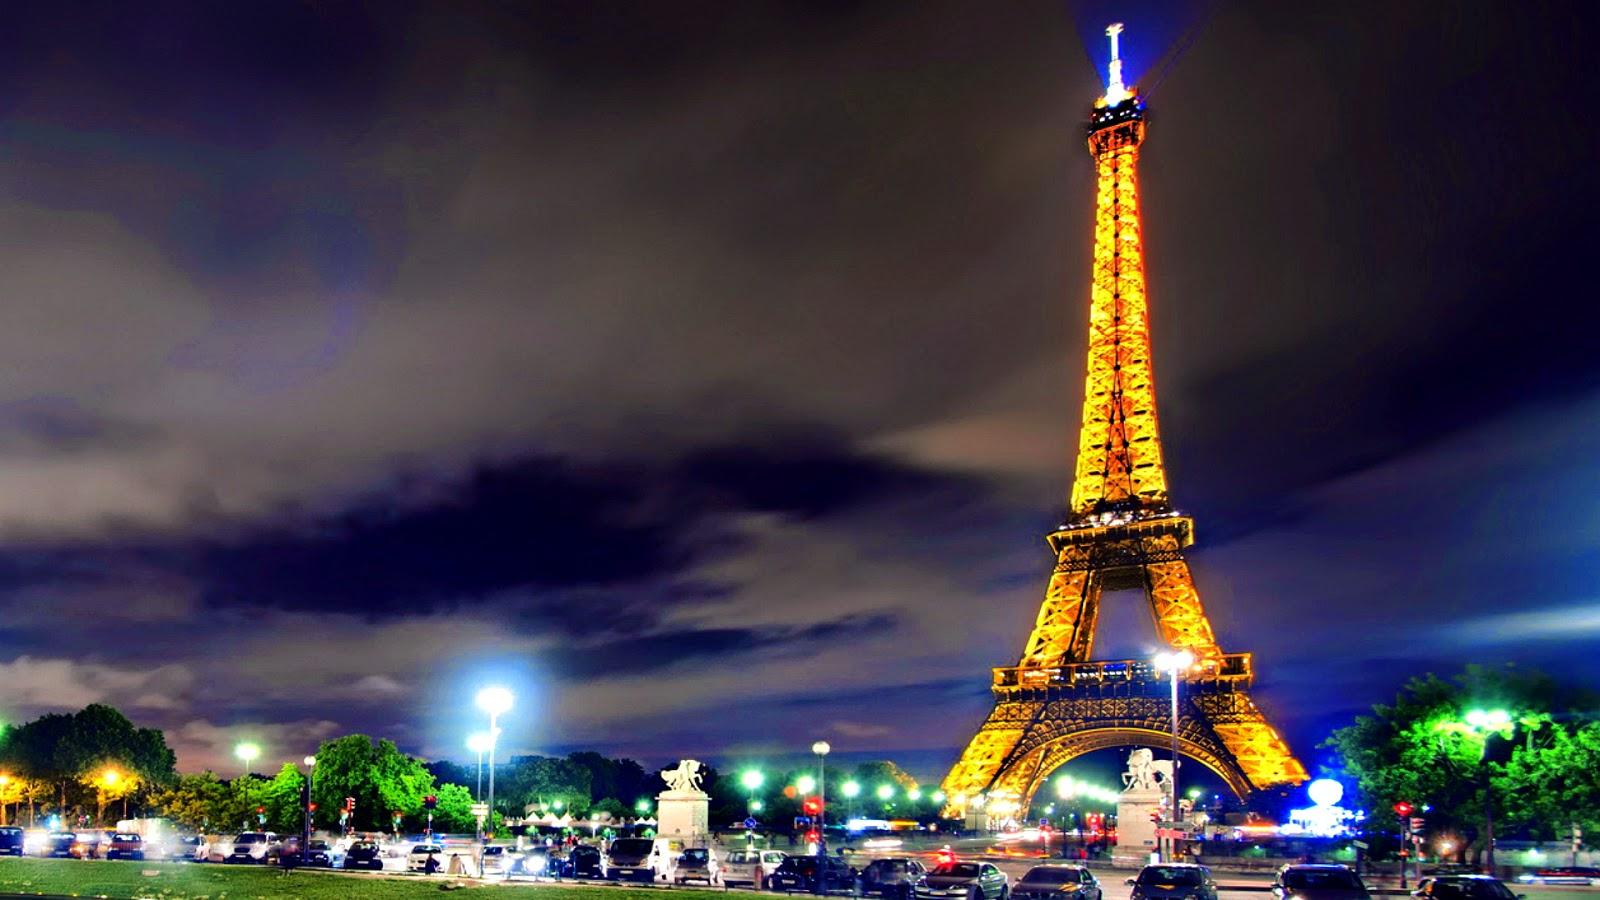 Eiffel Tower Nice Wallpapers